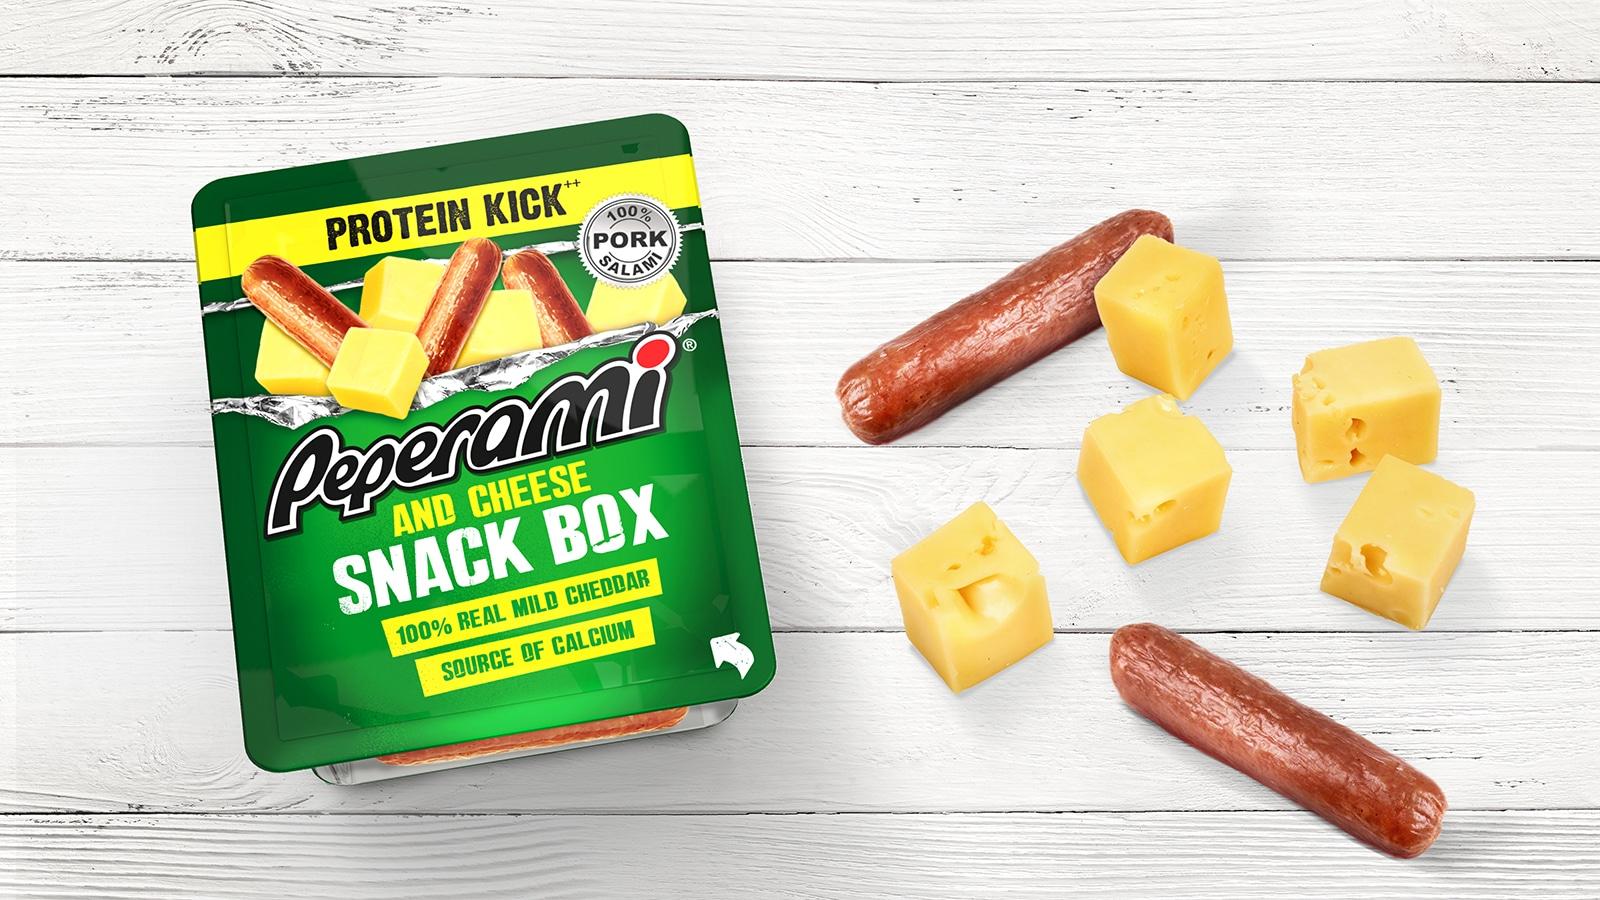 Snack box packaging | Peperami Branding